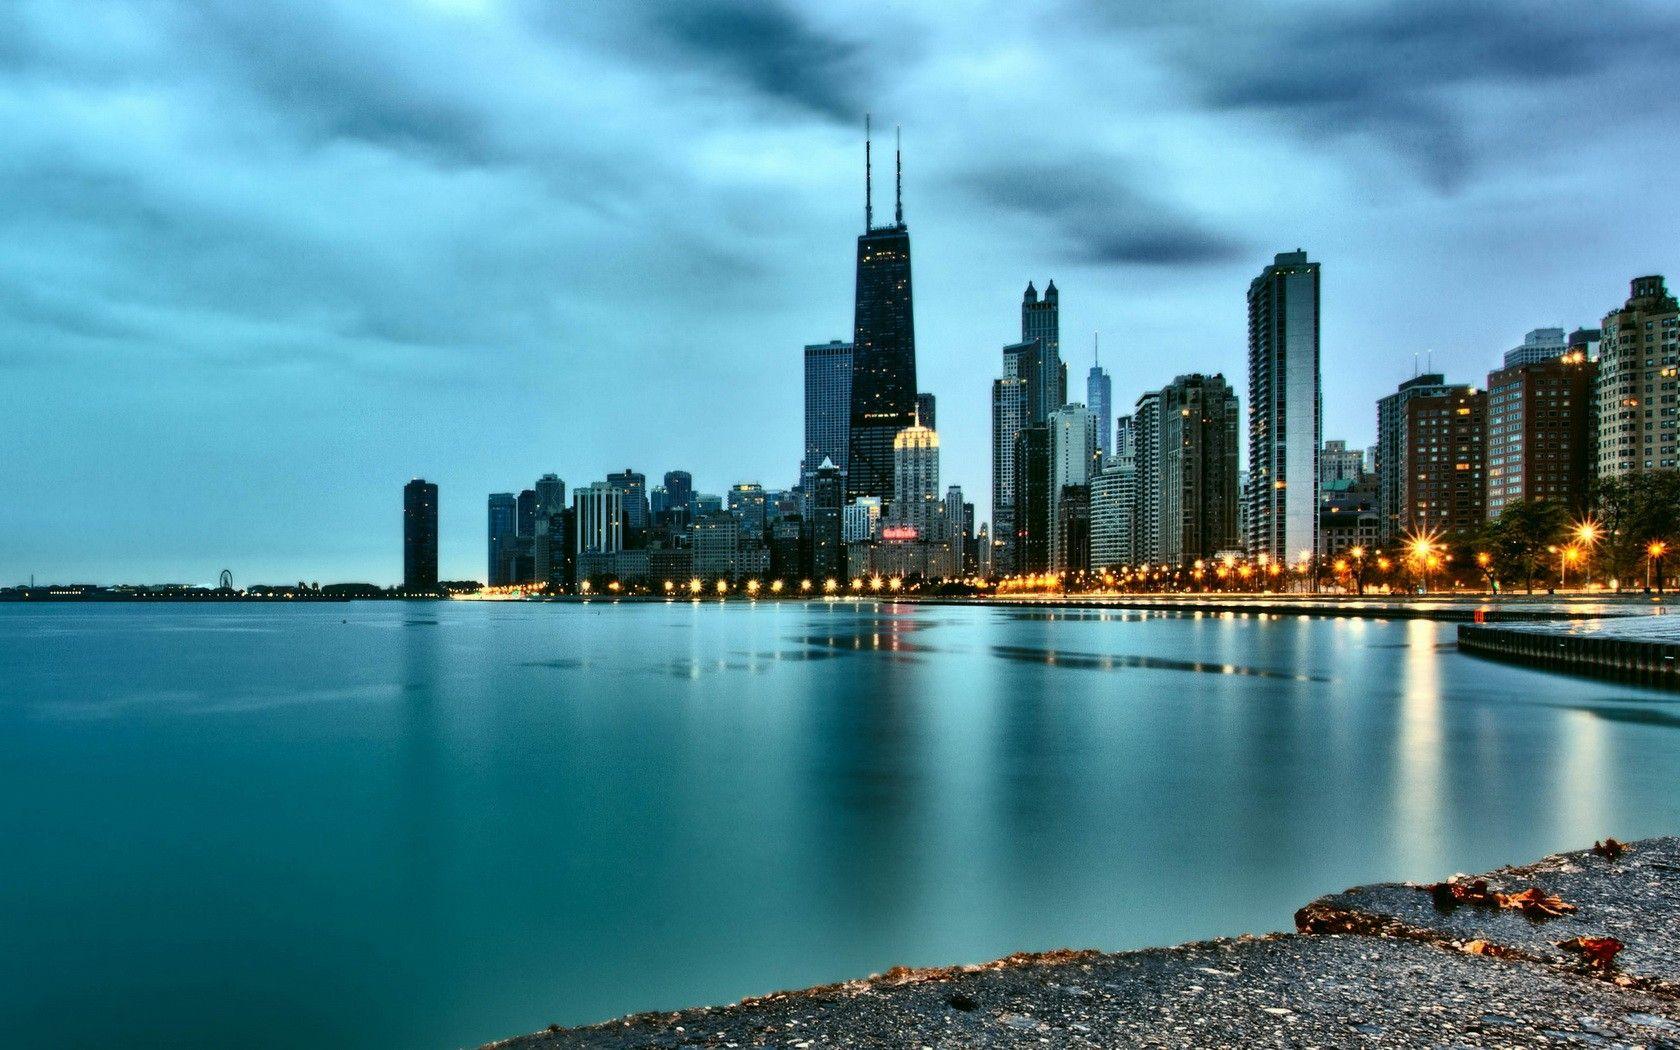 Chicago Hd Wallpaper Chicago Wallpaper Chicago Background Chicago Skyline Photography